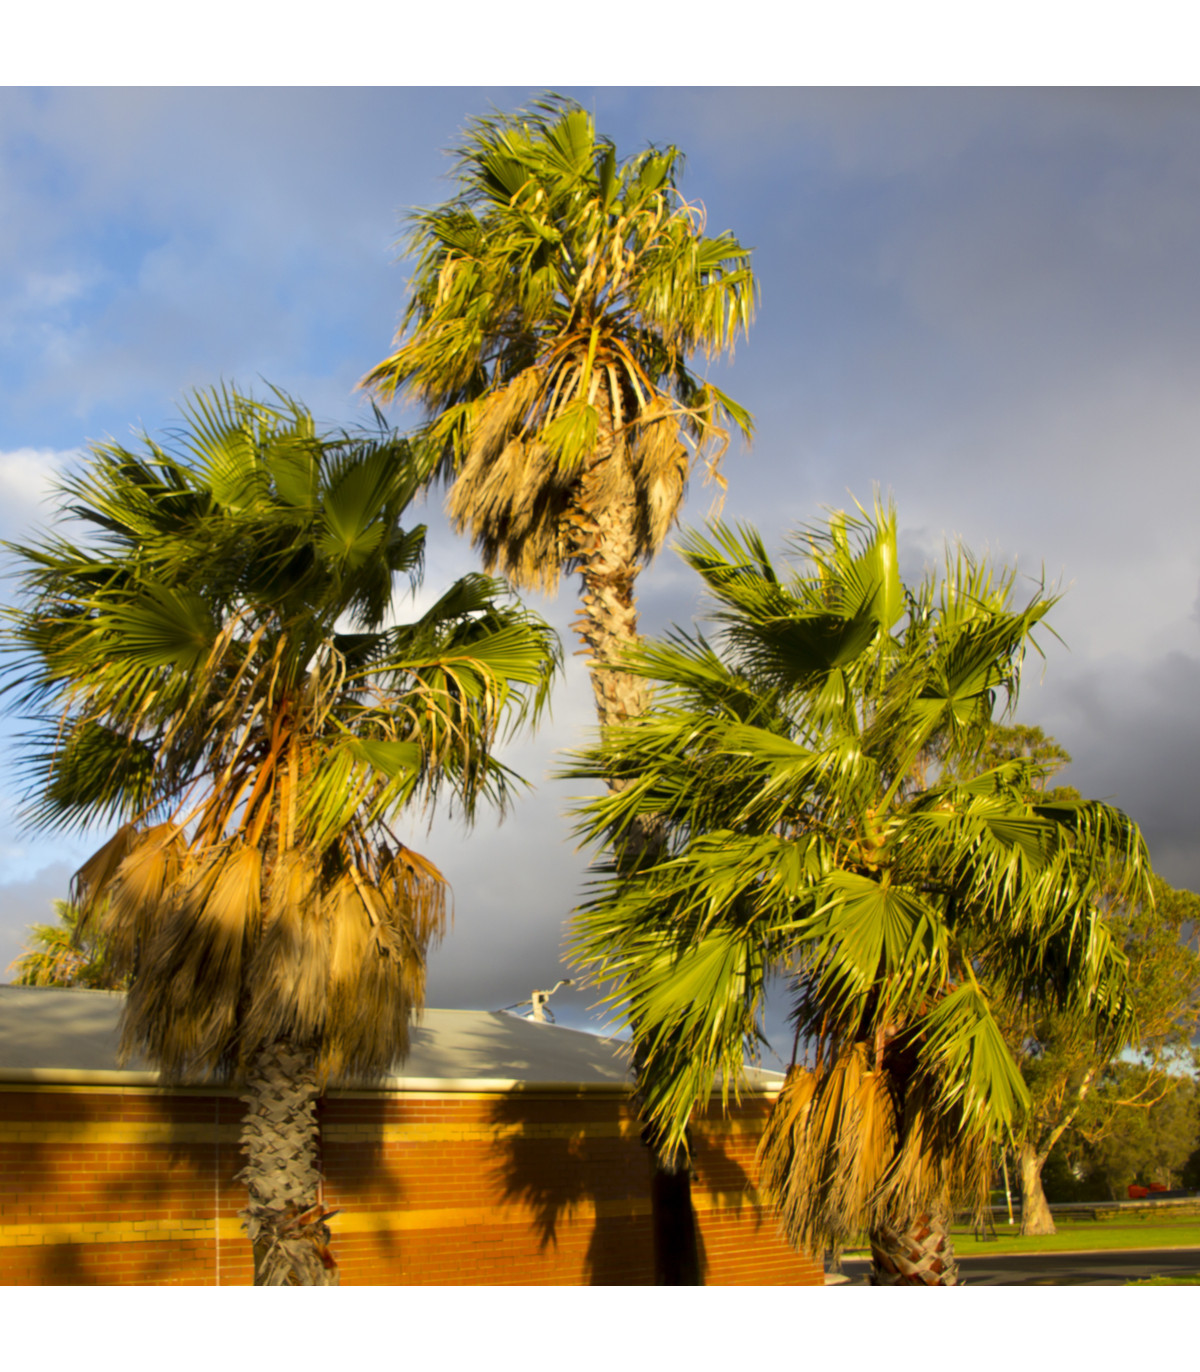 Palma Washingtonie vláknitá - semena mrazuvzdorné palmy - Washingtonia filifera - 3 ks